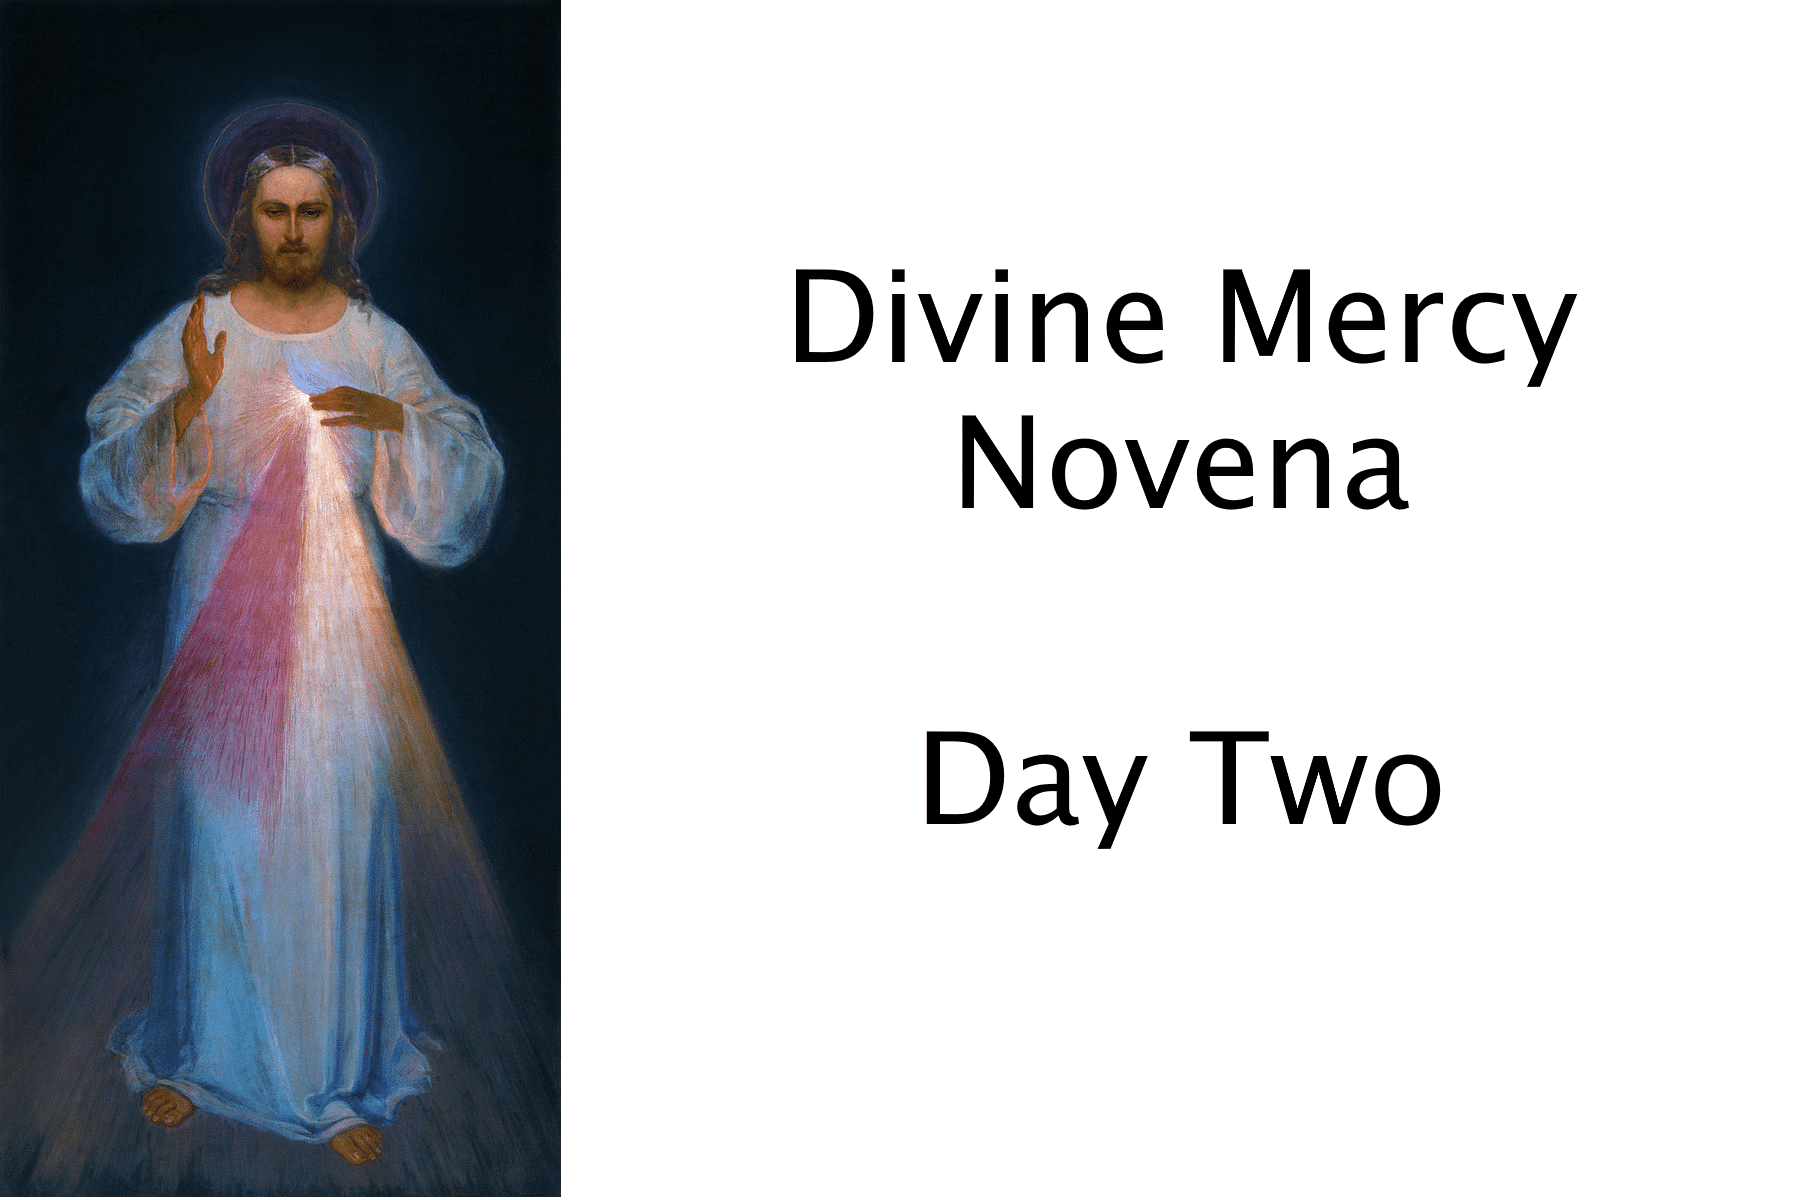 Divine Mercy Novena Day Two